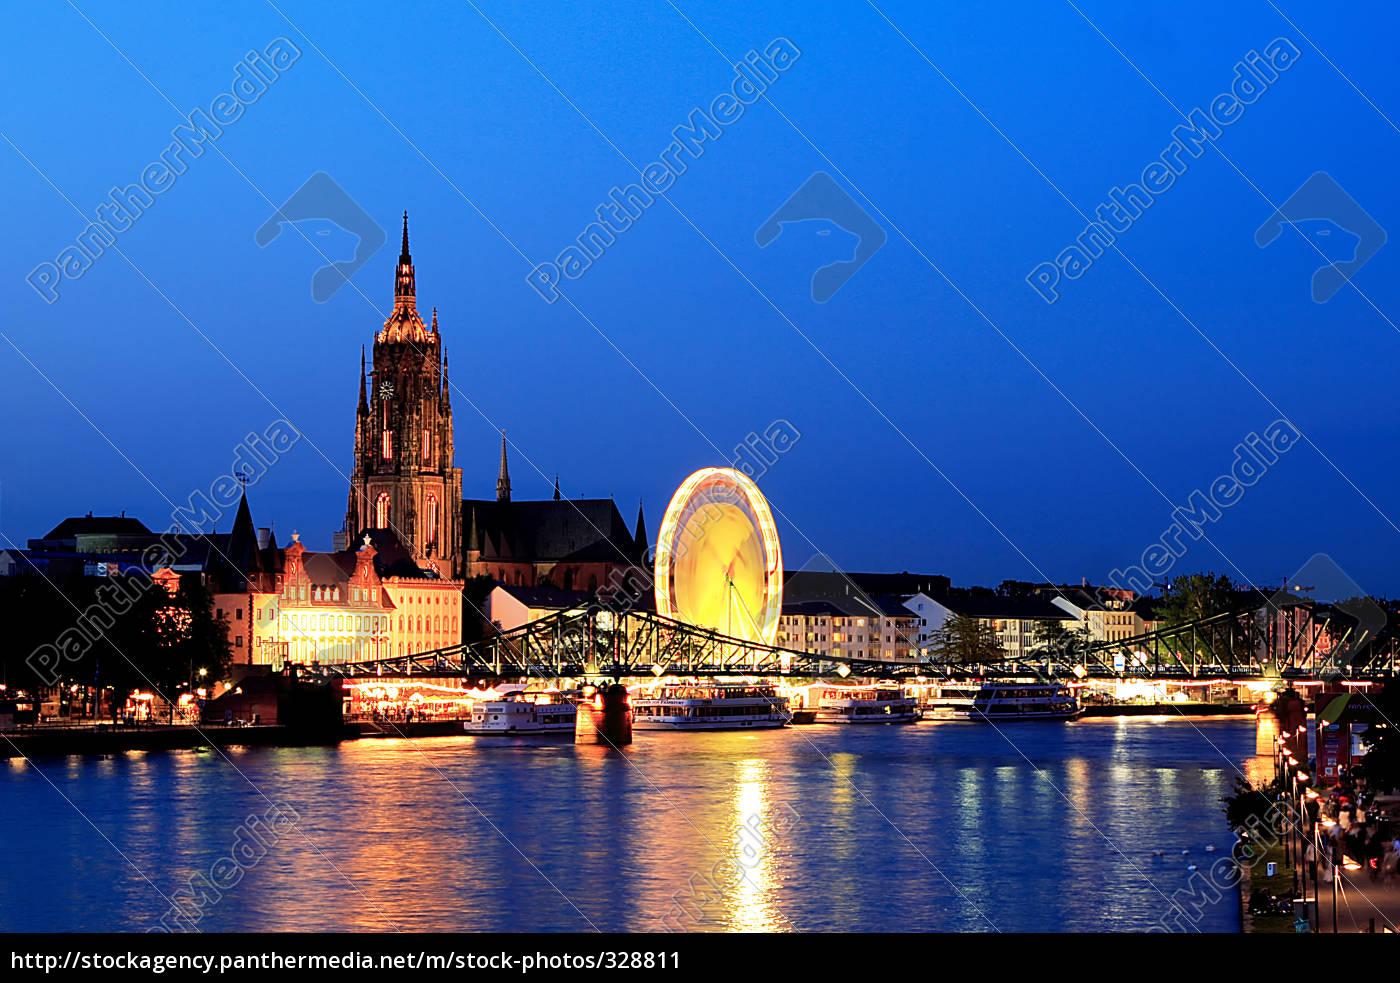 frankfurt, celebrates - 328811